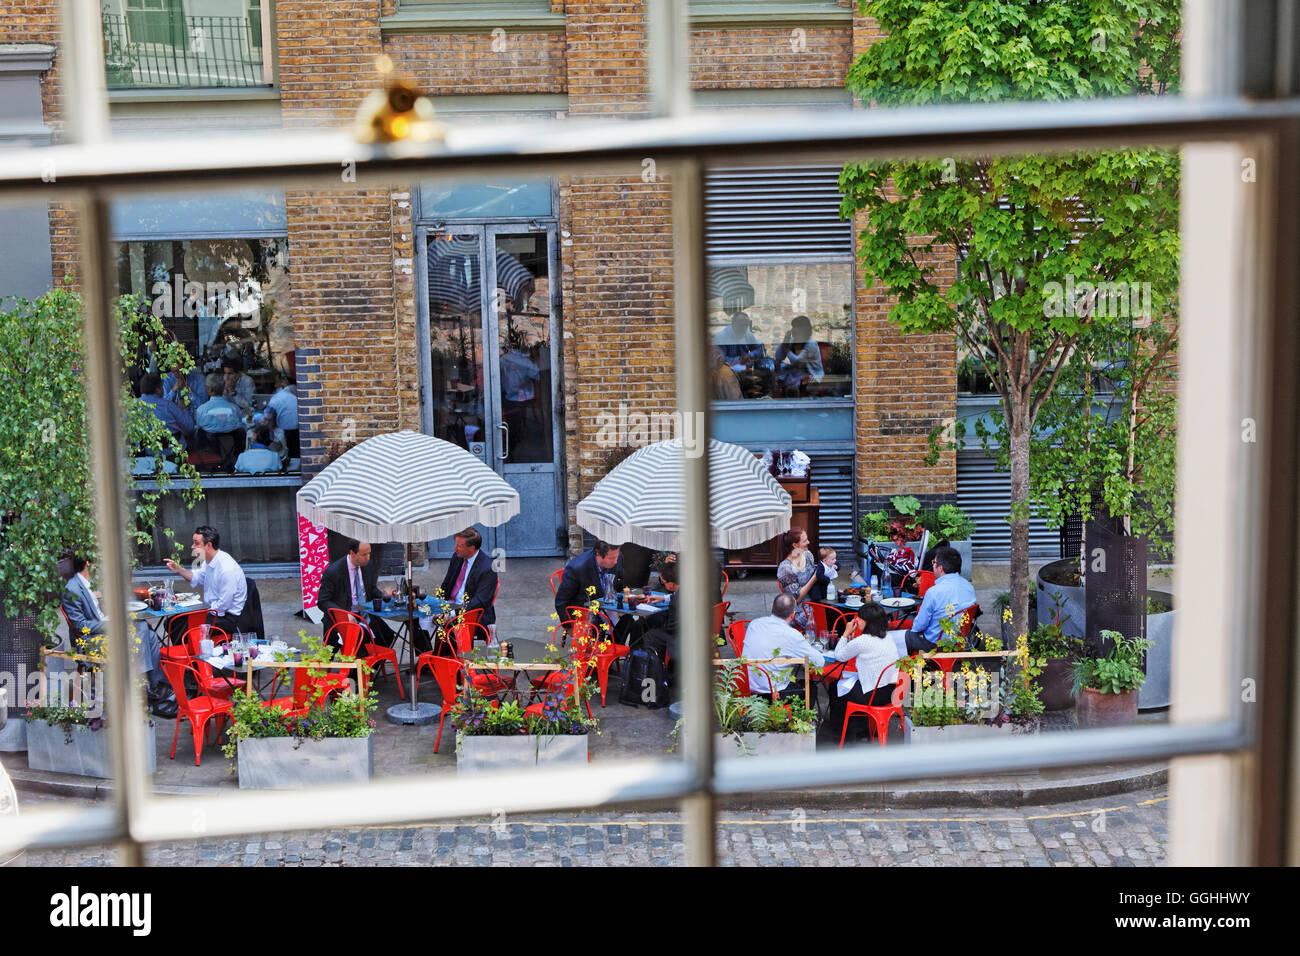 Terrace, Bistrot Bruno Loubet in Hotel Zetter, St. John's Square, Clerkenwell, London, England, United Kingdom - Stock Image